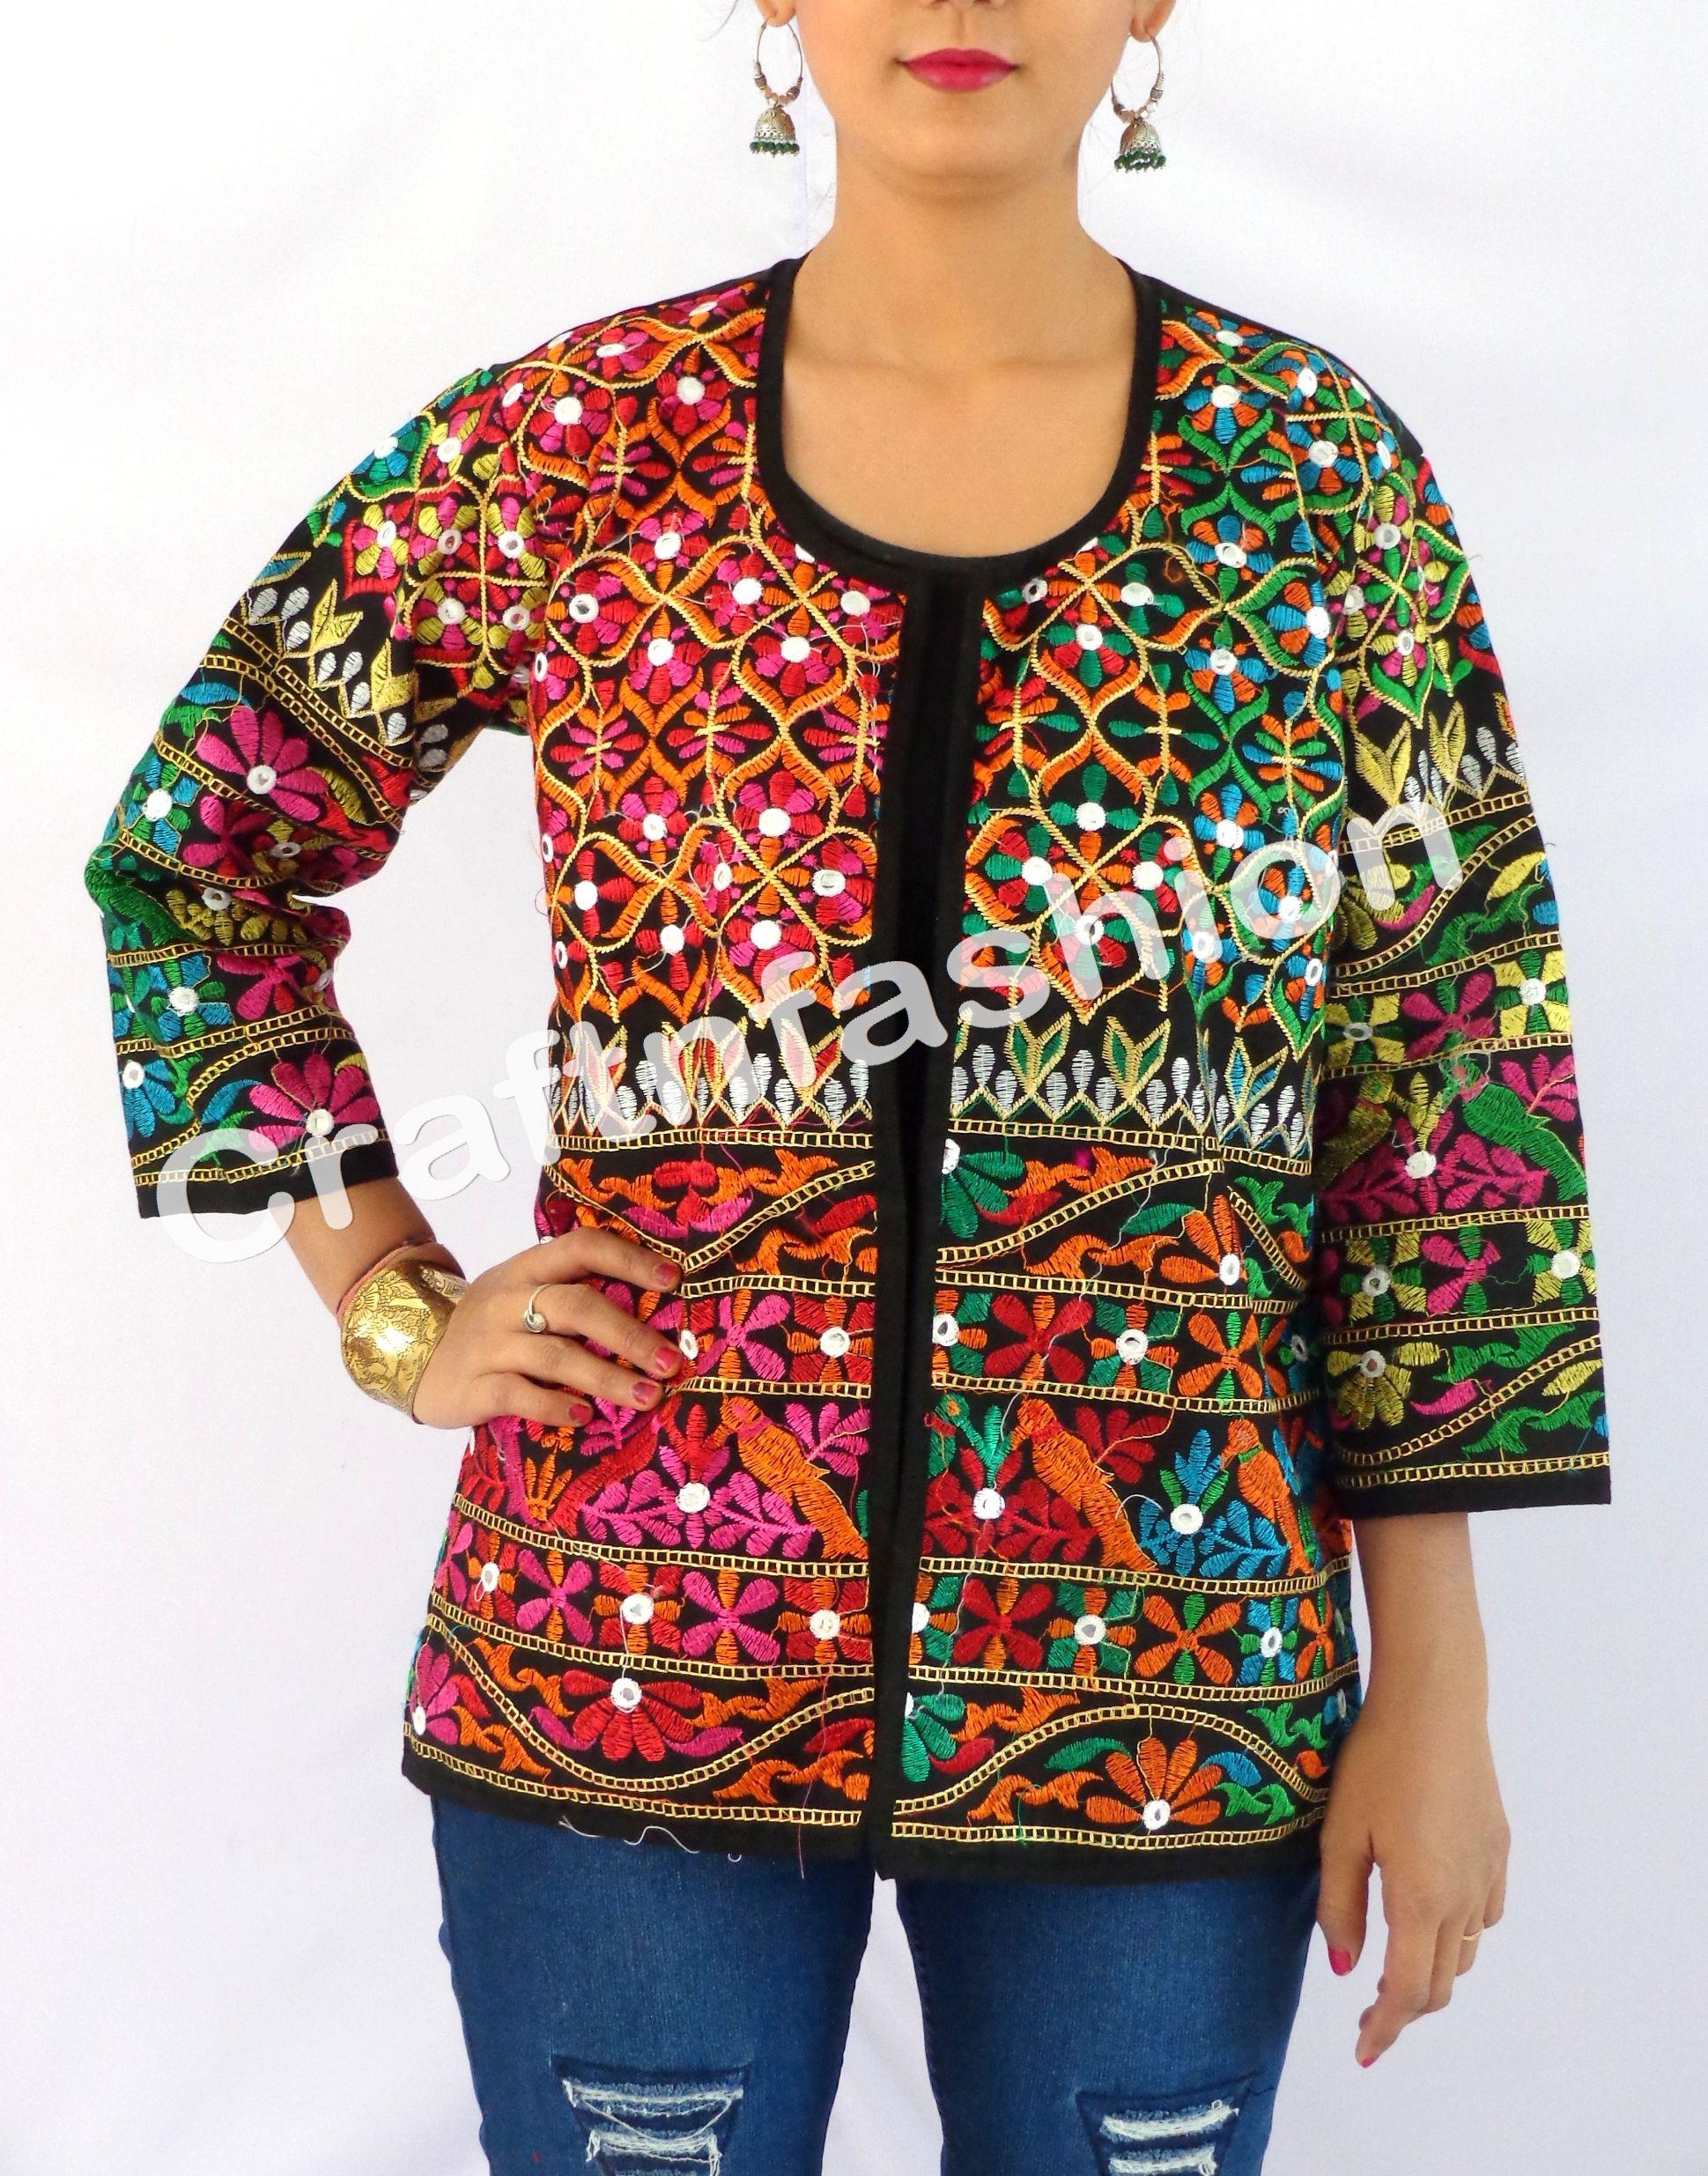 Gujarati Kutchi Jacket / Mirror Work Jacket / Indian Jacket / Traditional  Jacket / Banjara Jacket / Gypsy Jacket / boho jacket / India Embroidered  Jacket ...